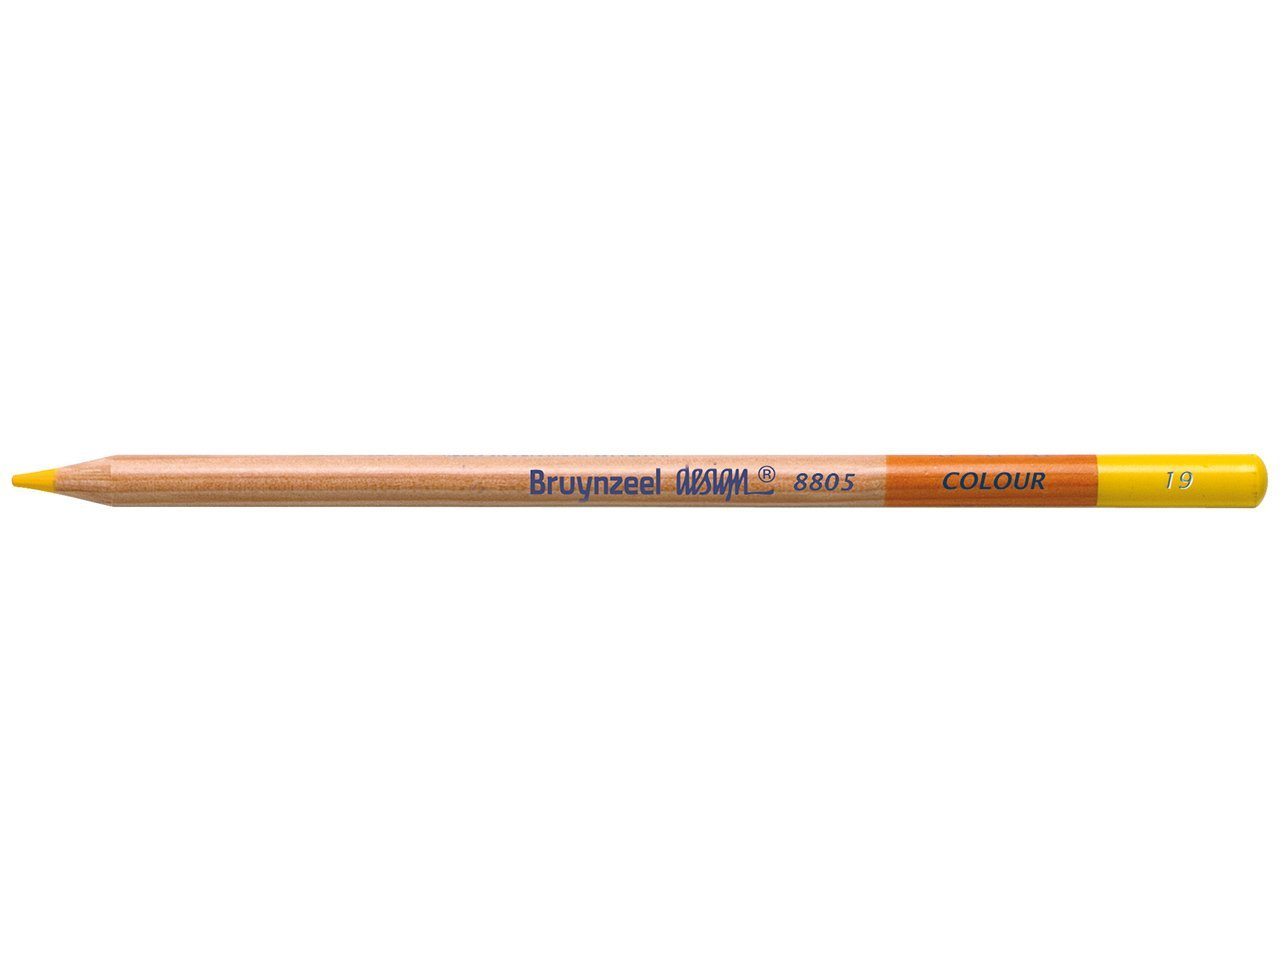 Bruynzeel Pencil - 19 Naples Yellow